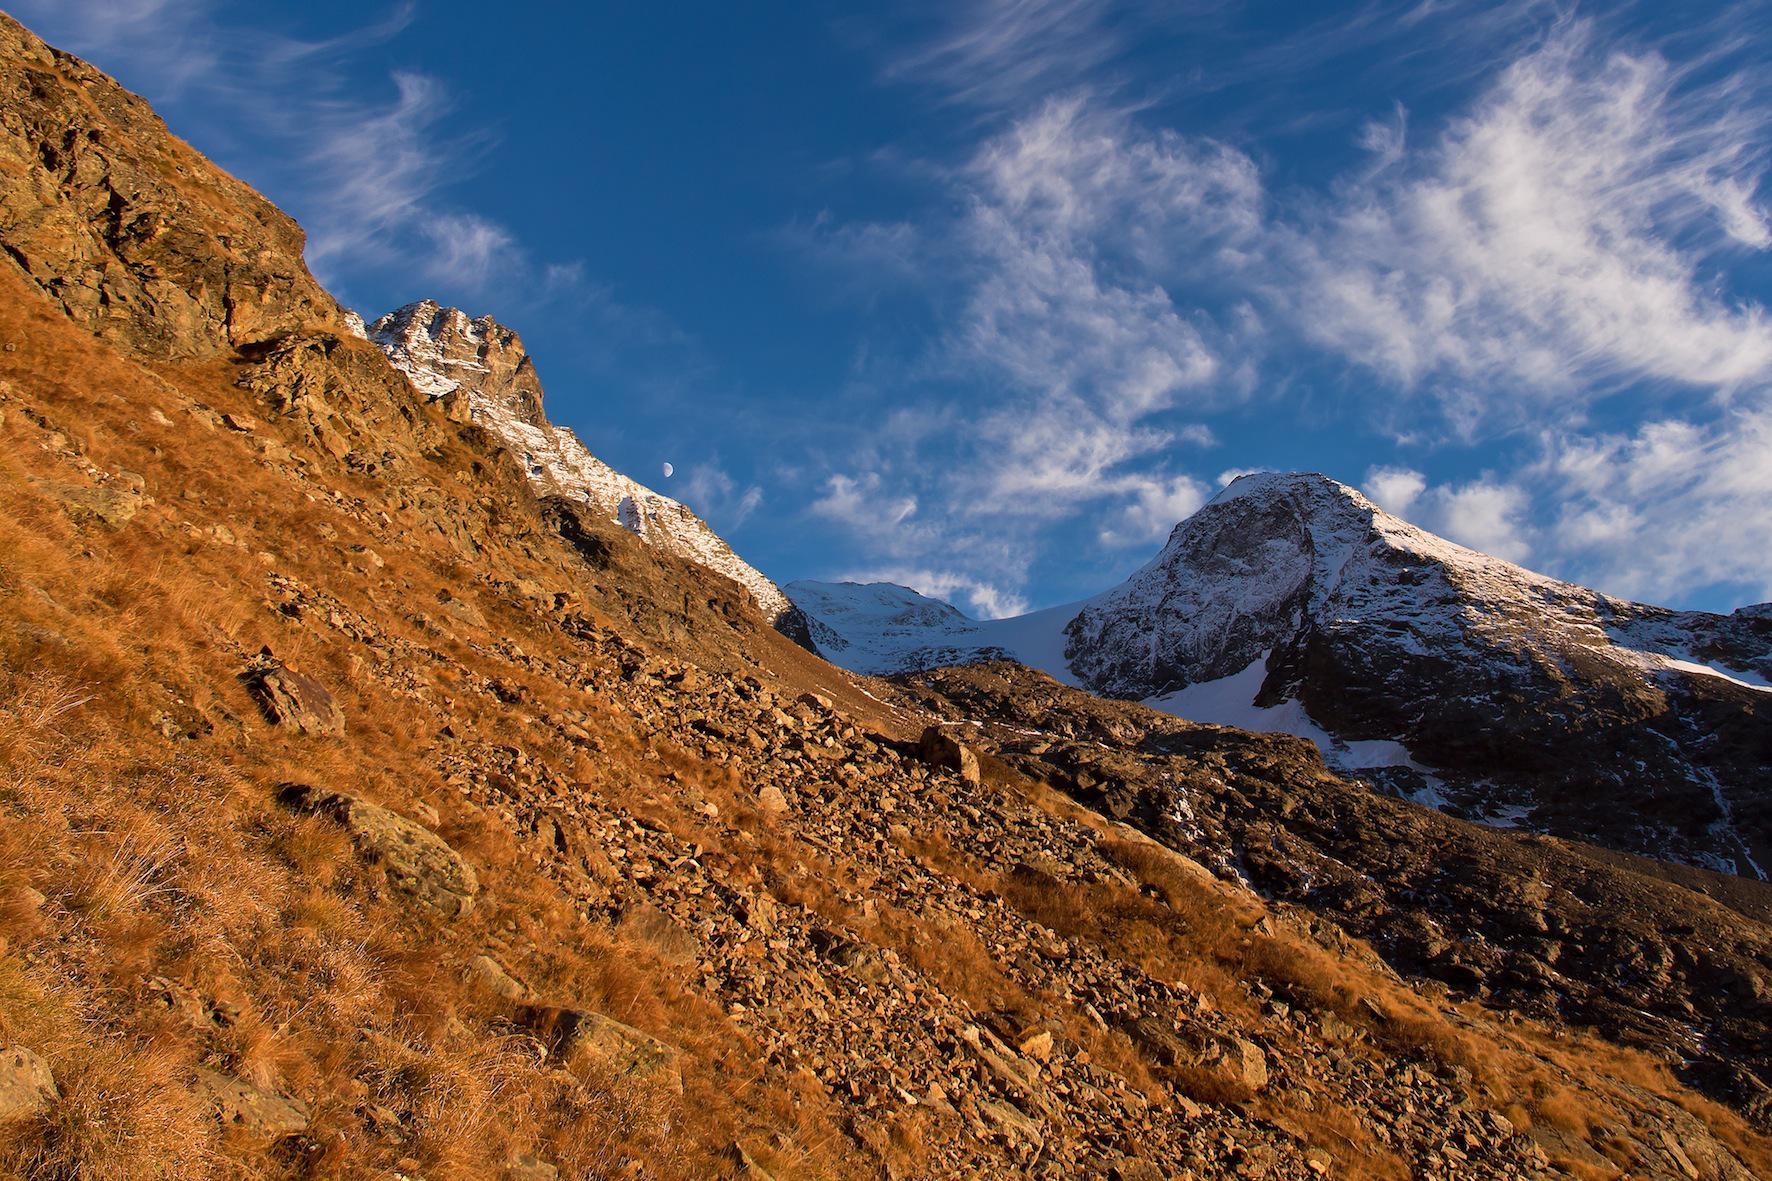 Sopra l'Alpe Bellatsa il tramonto tinge d'oro la Tour du Creton e lo Chateau des Dames